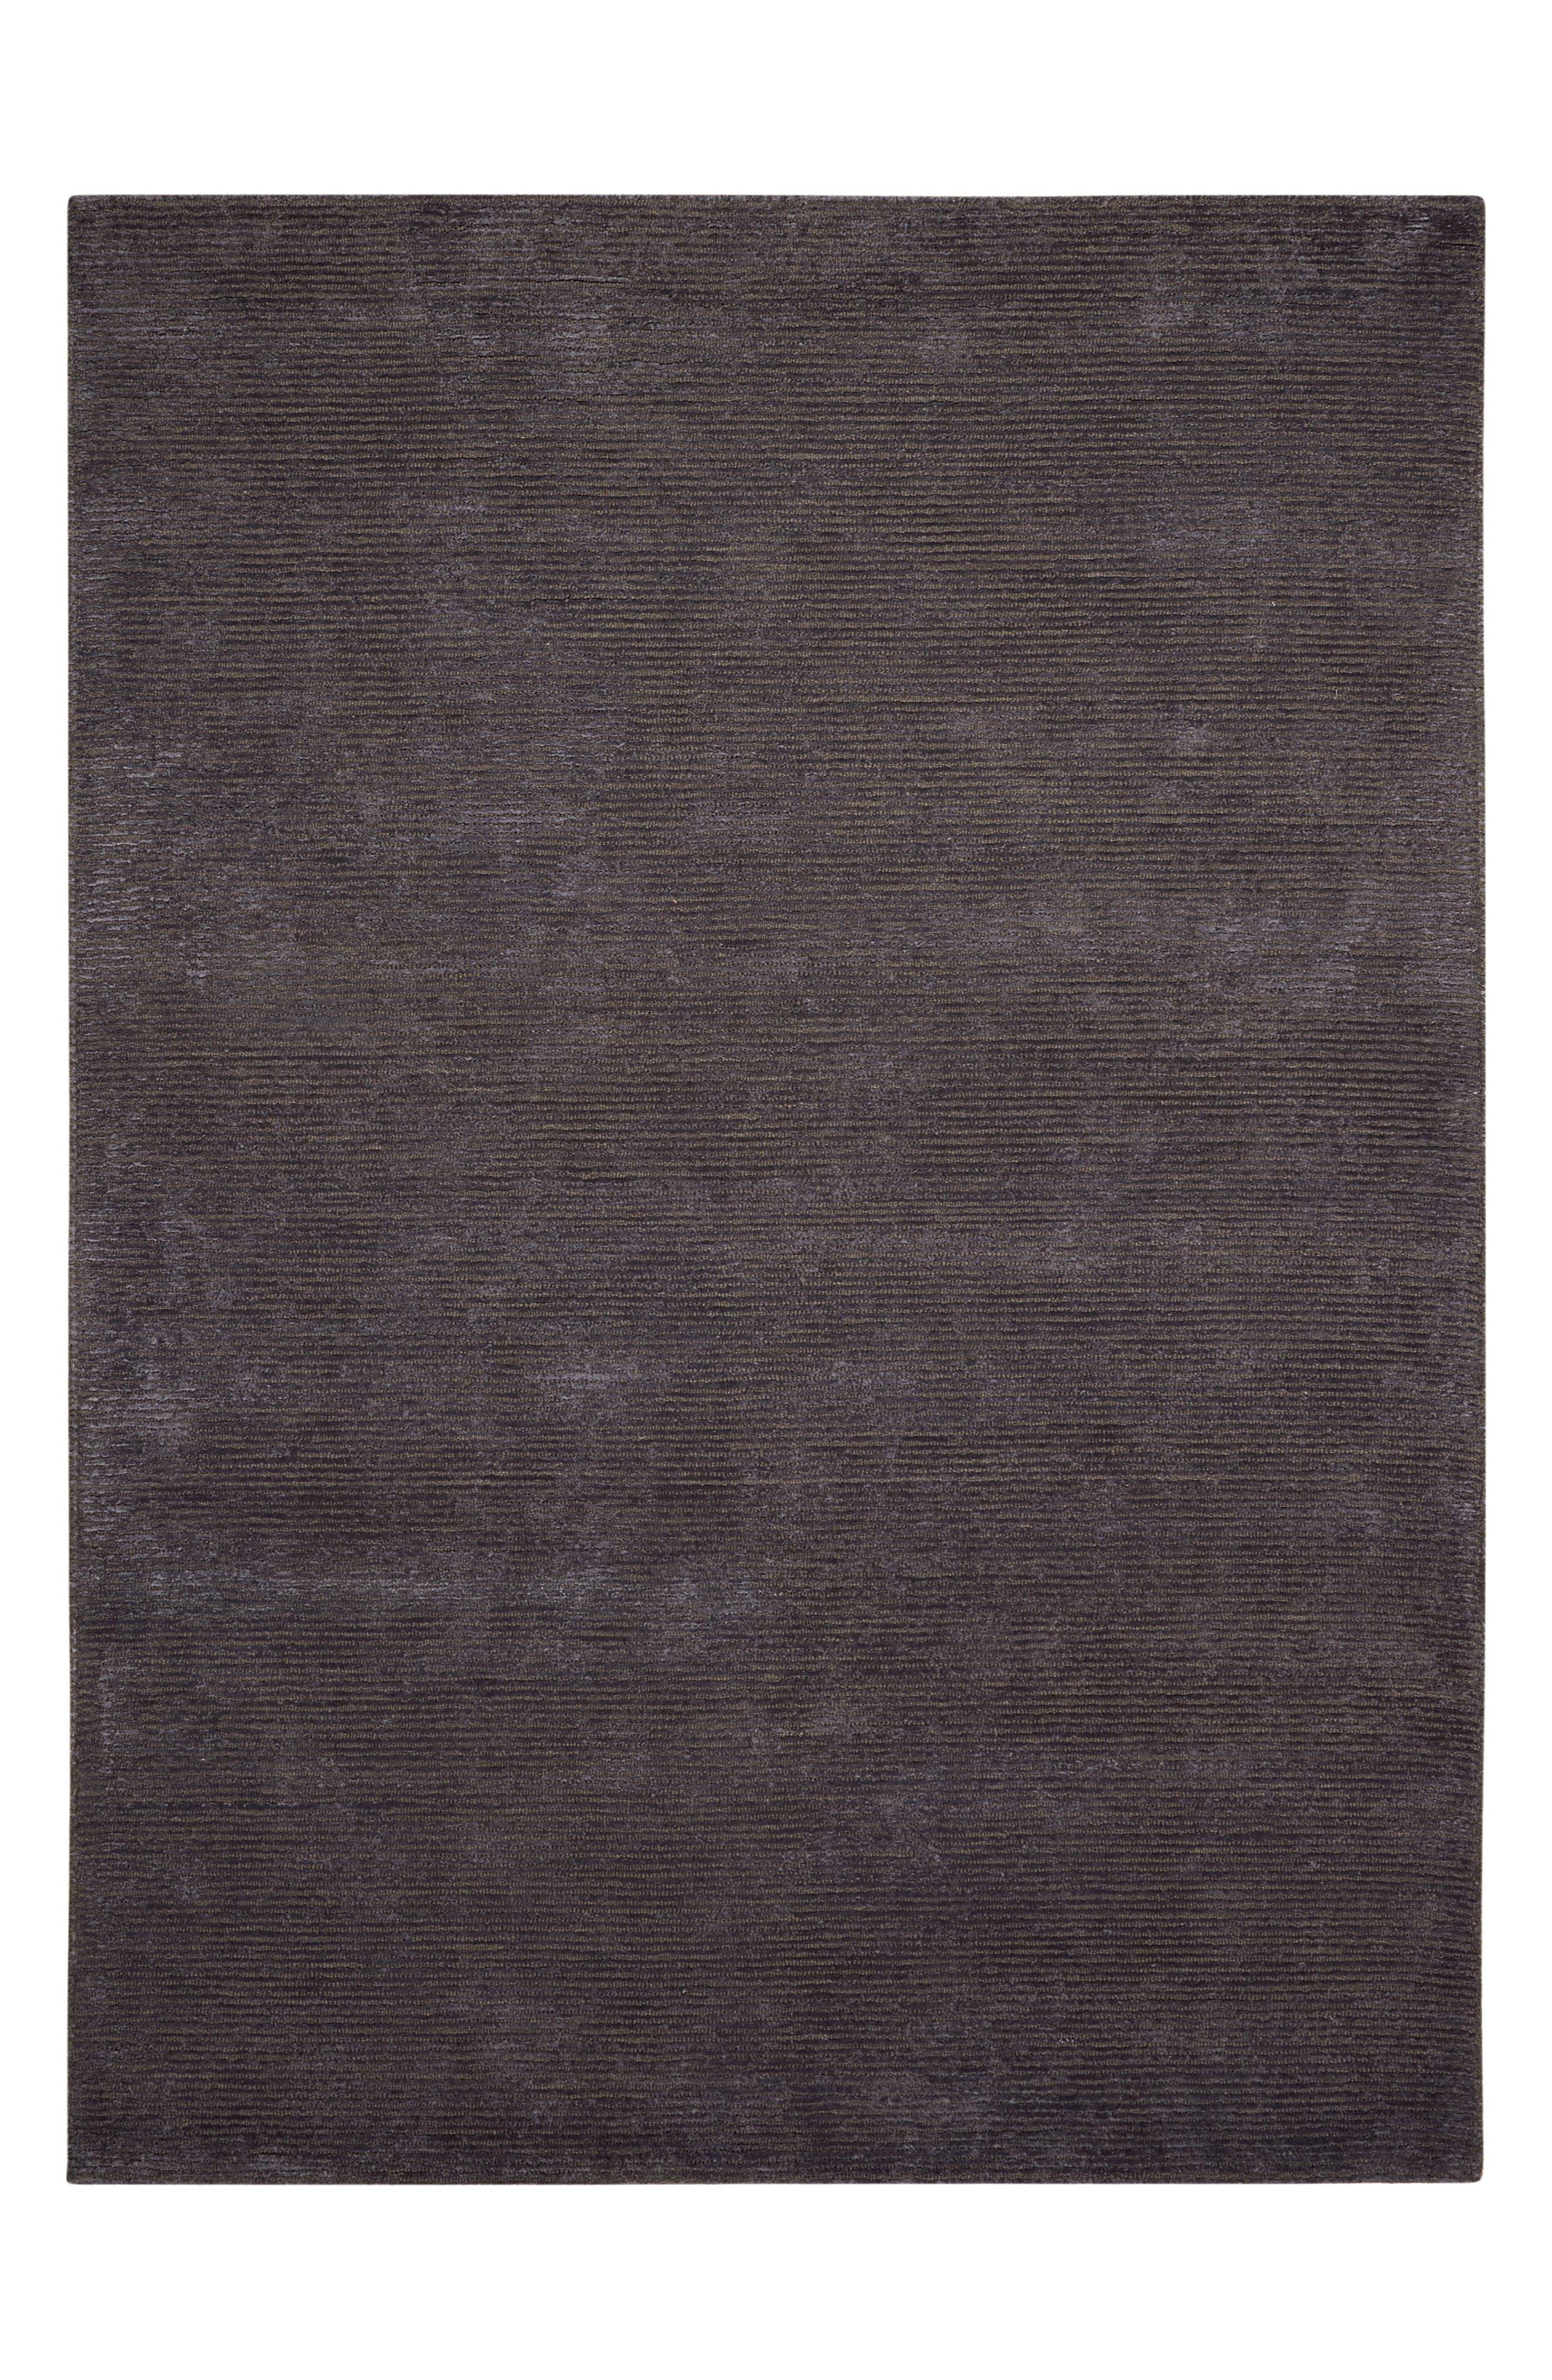 Ravine Furrow Handwoven Area Rug,                             Main thumbnail 1, color,                             001